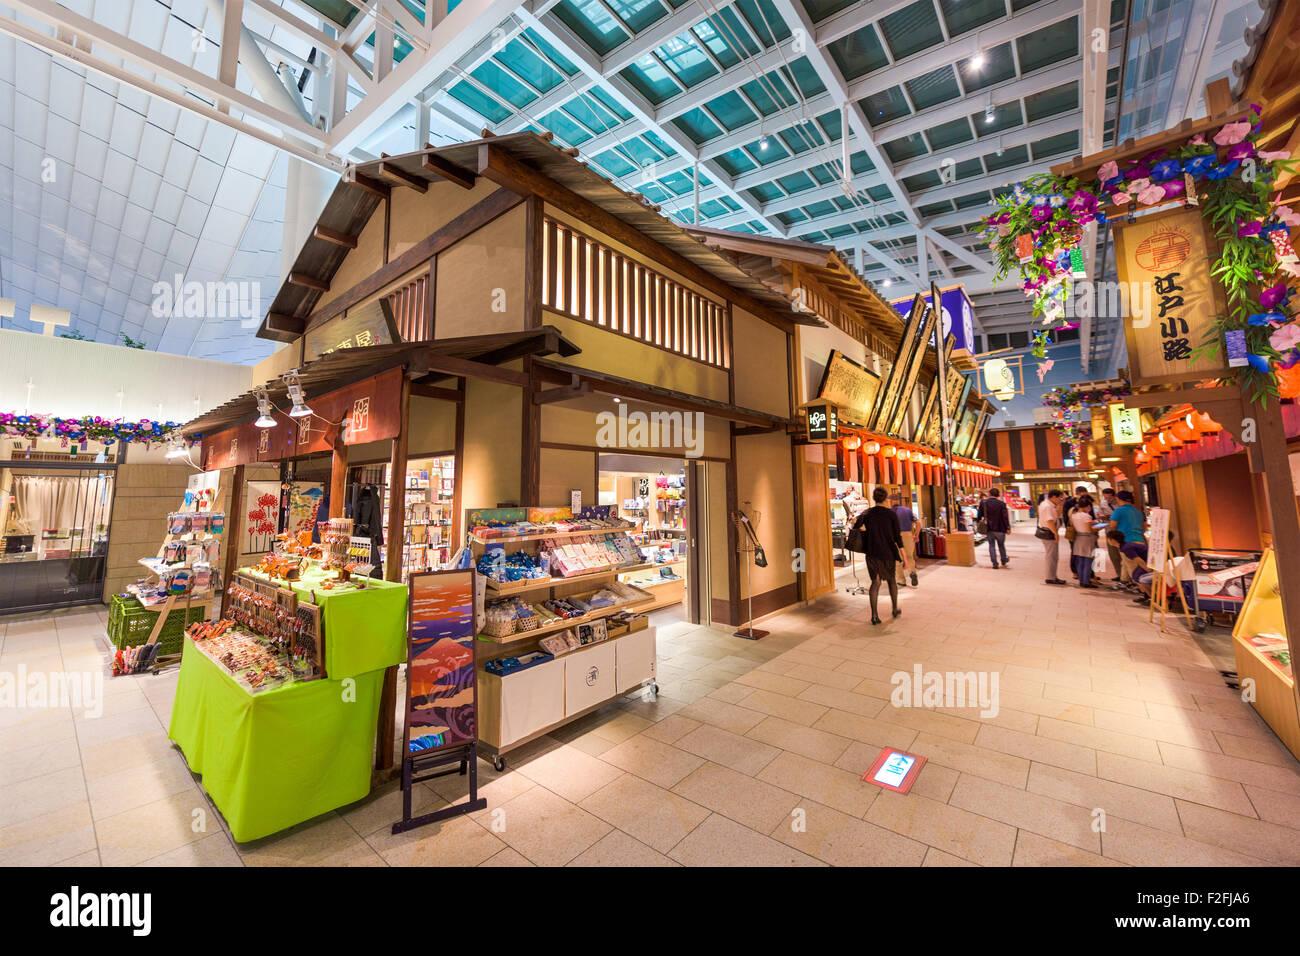 Flughafen Tokio-Haneda auf dem Edo-Markt in Tokio, Japan. Stockbild